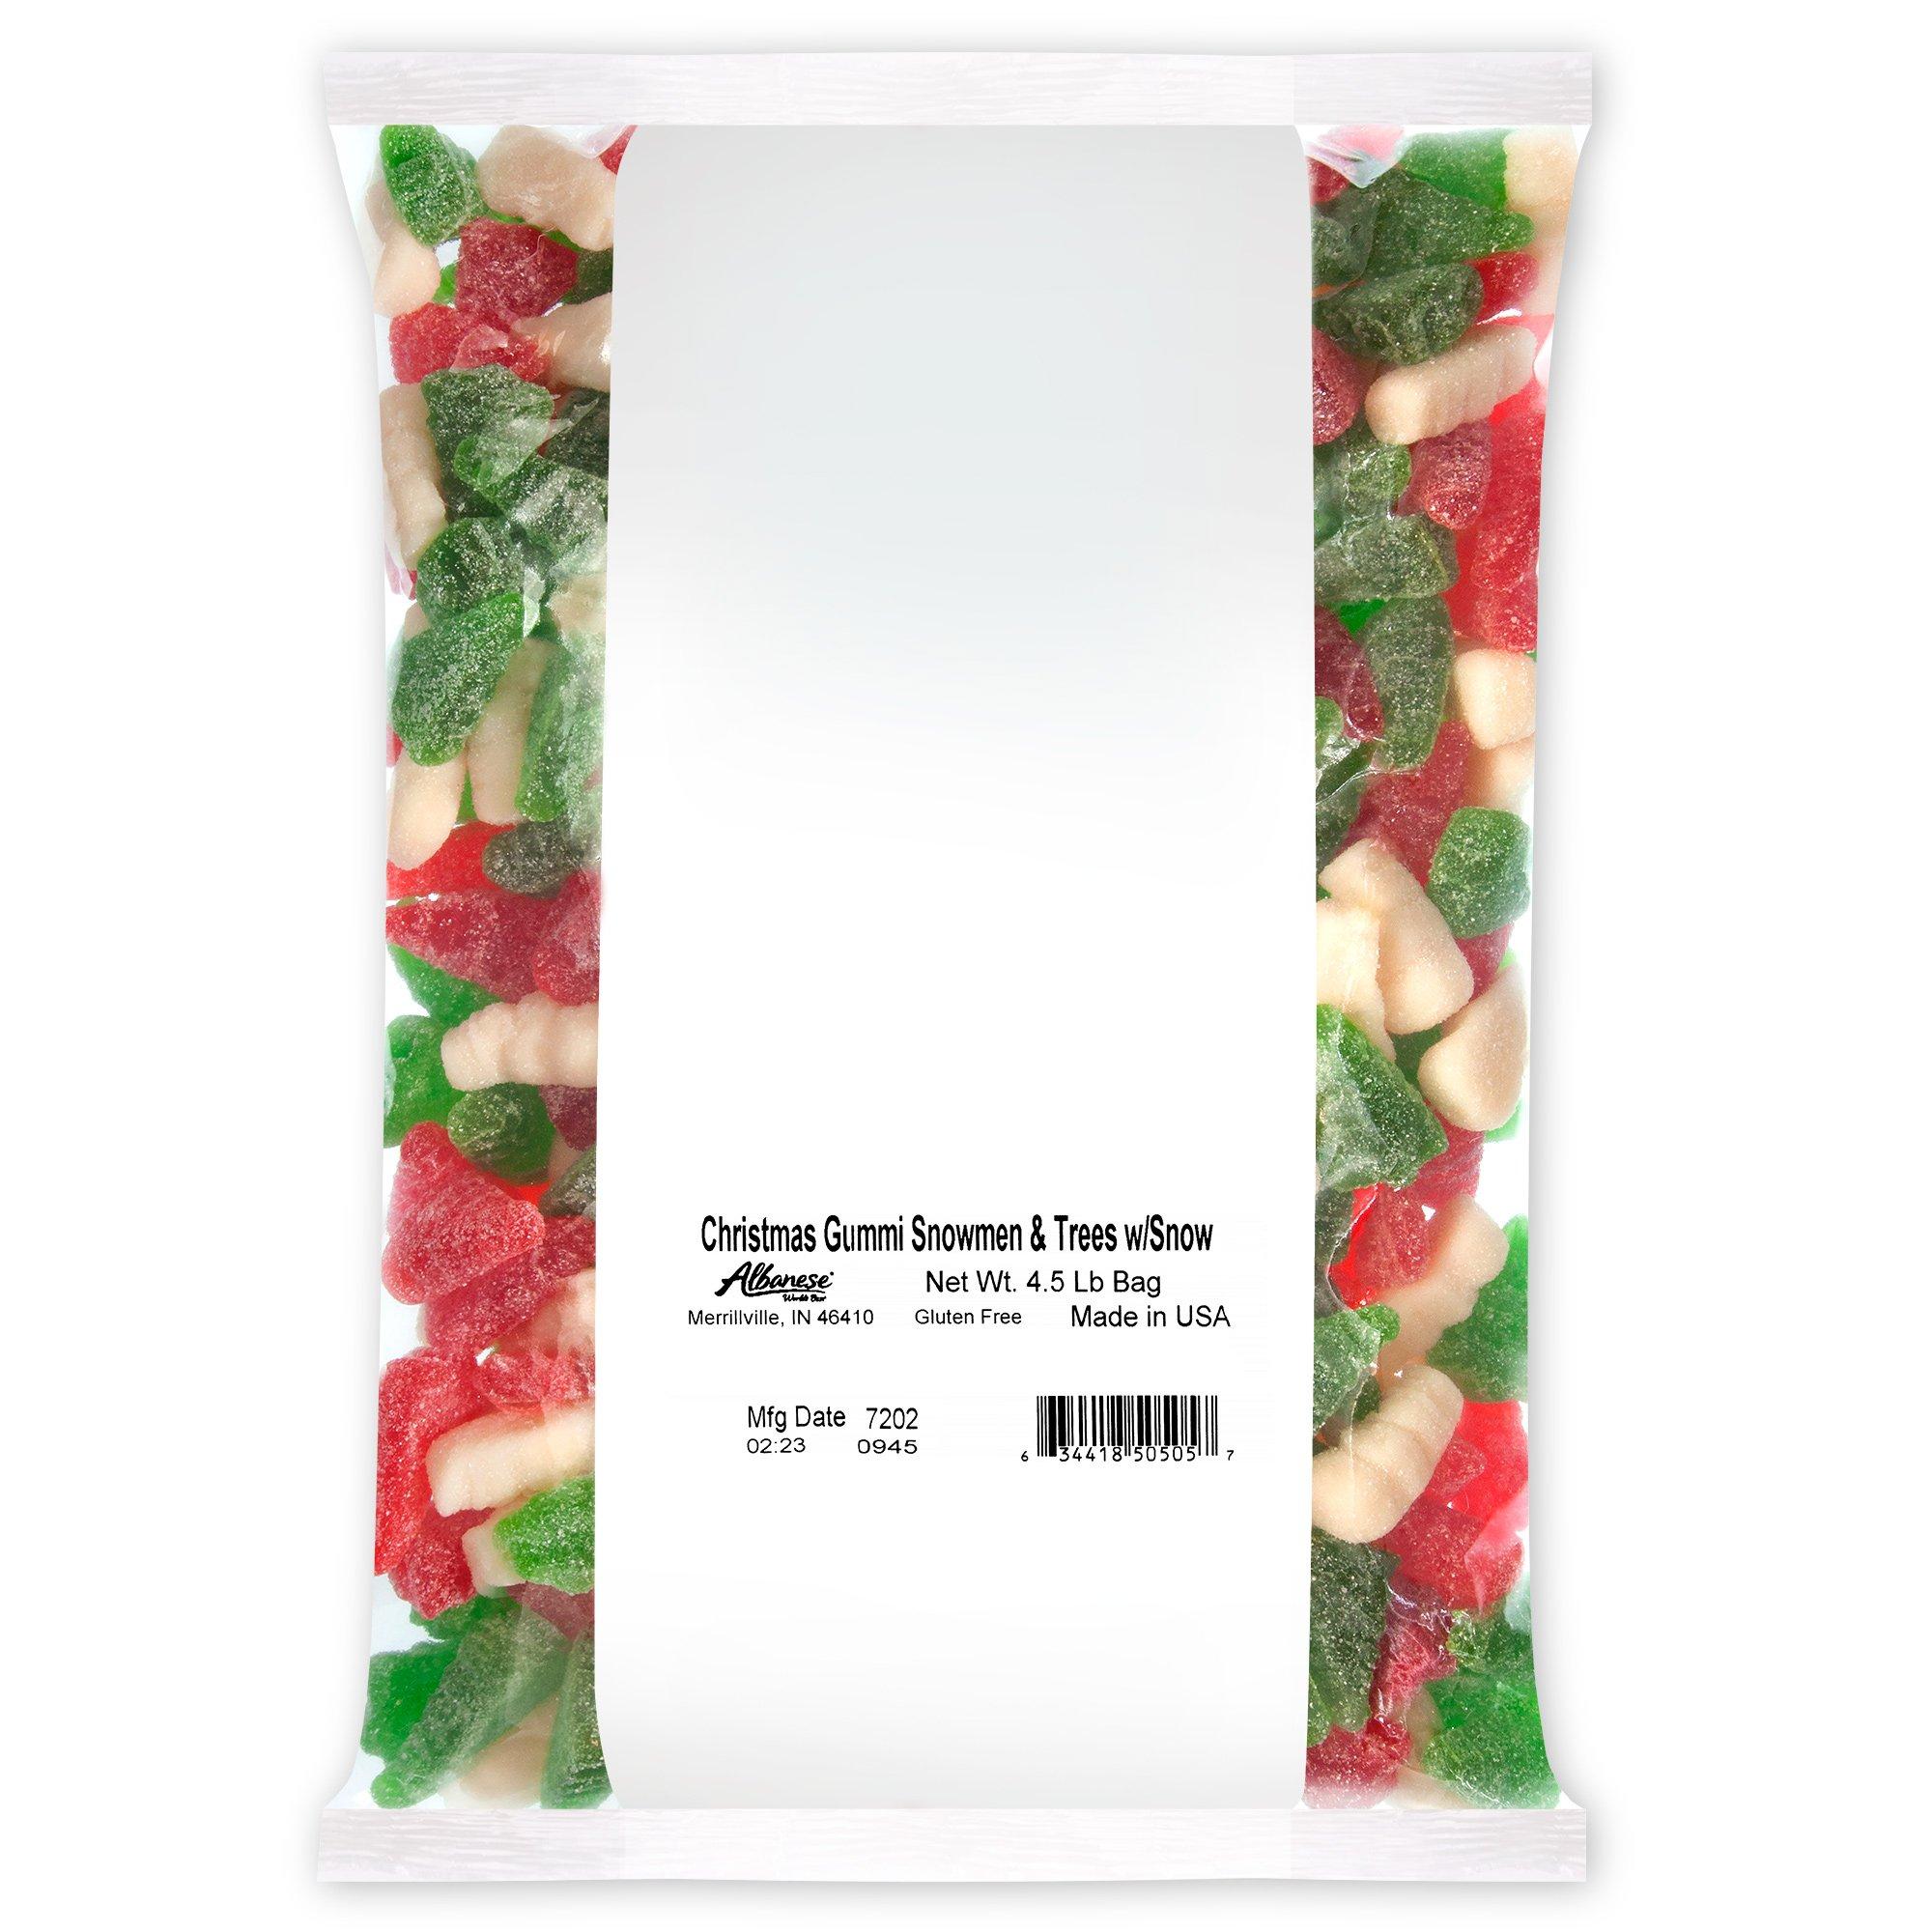 Albanese Candy, Christmas Gummi Snowmen & Trees with Snow, 4.5 Pound Bag